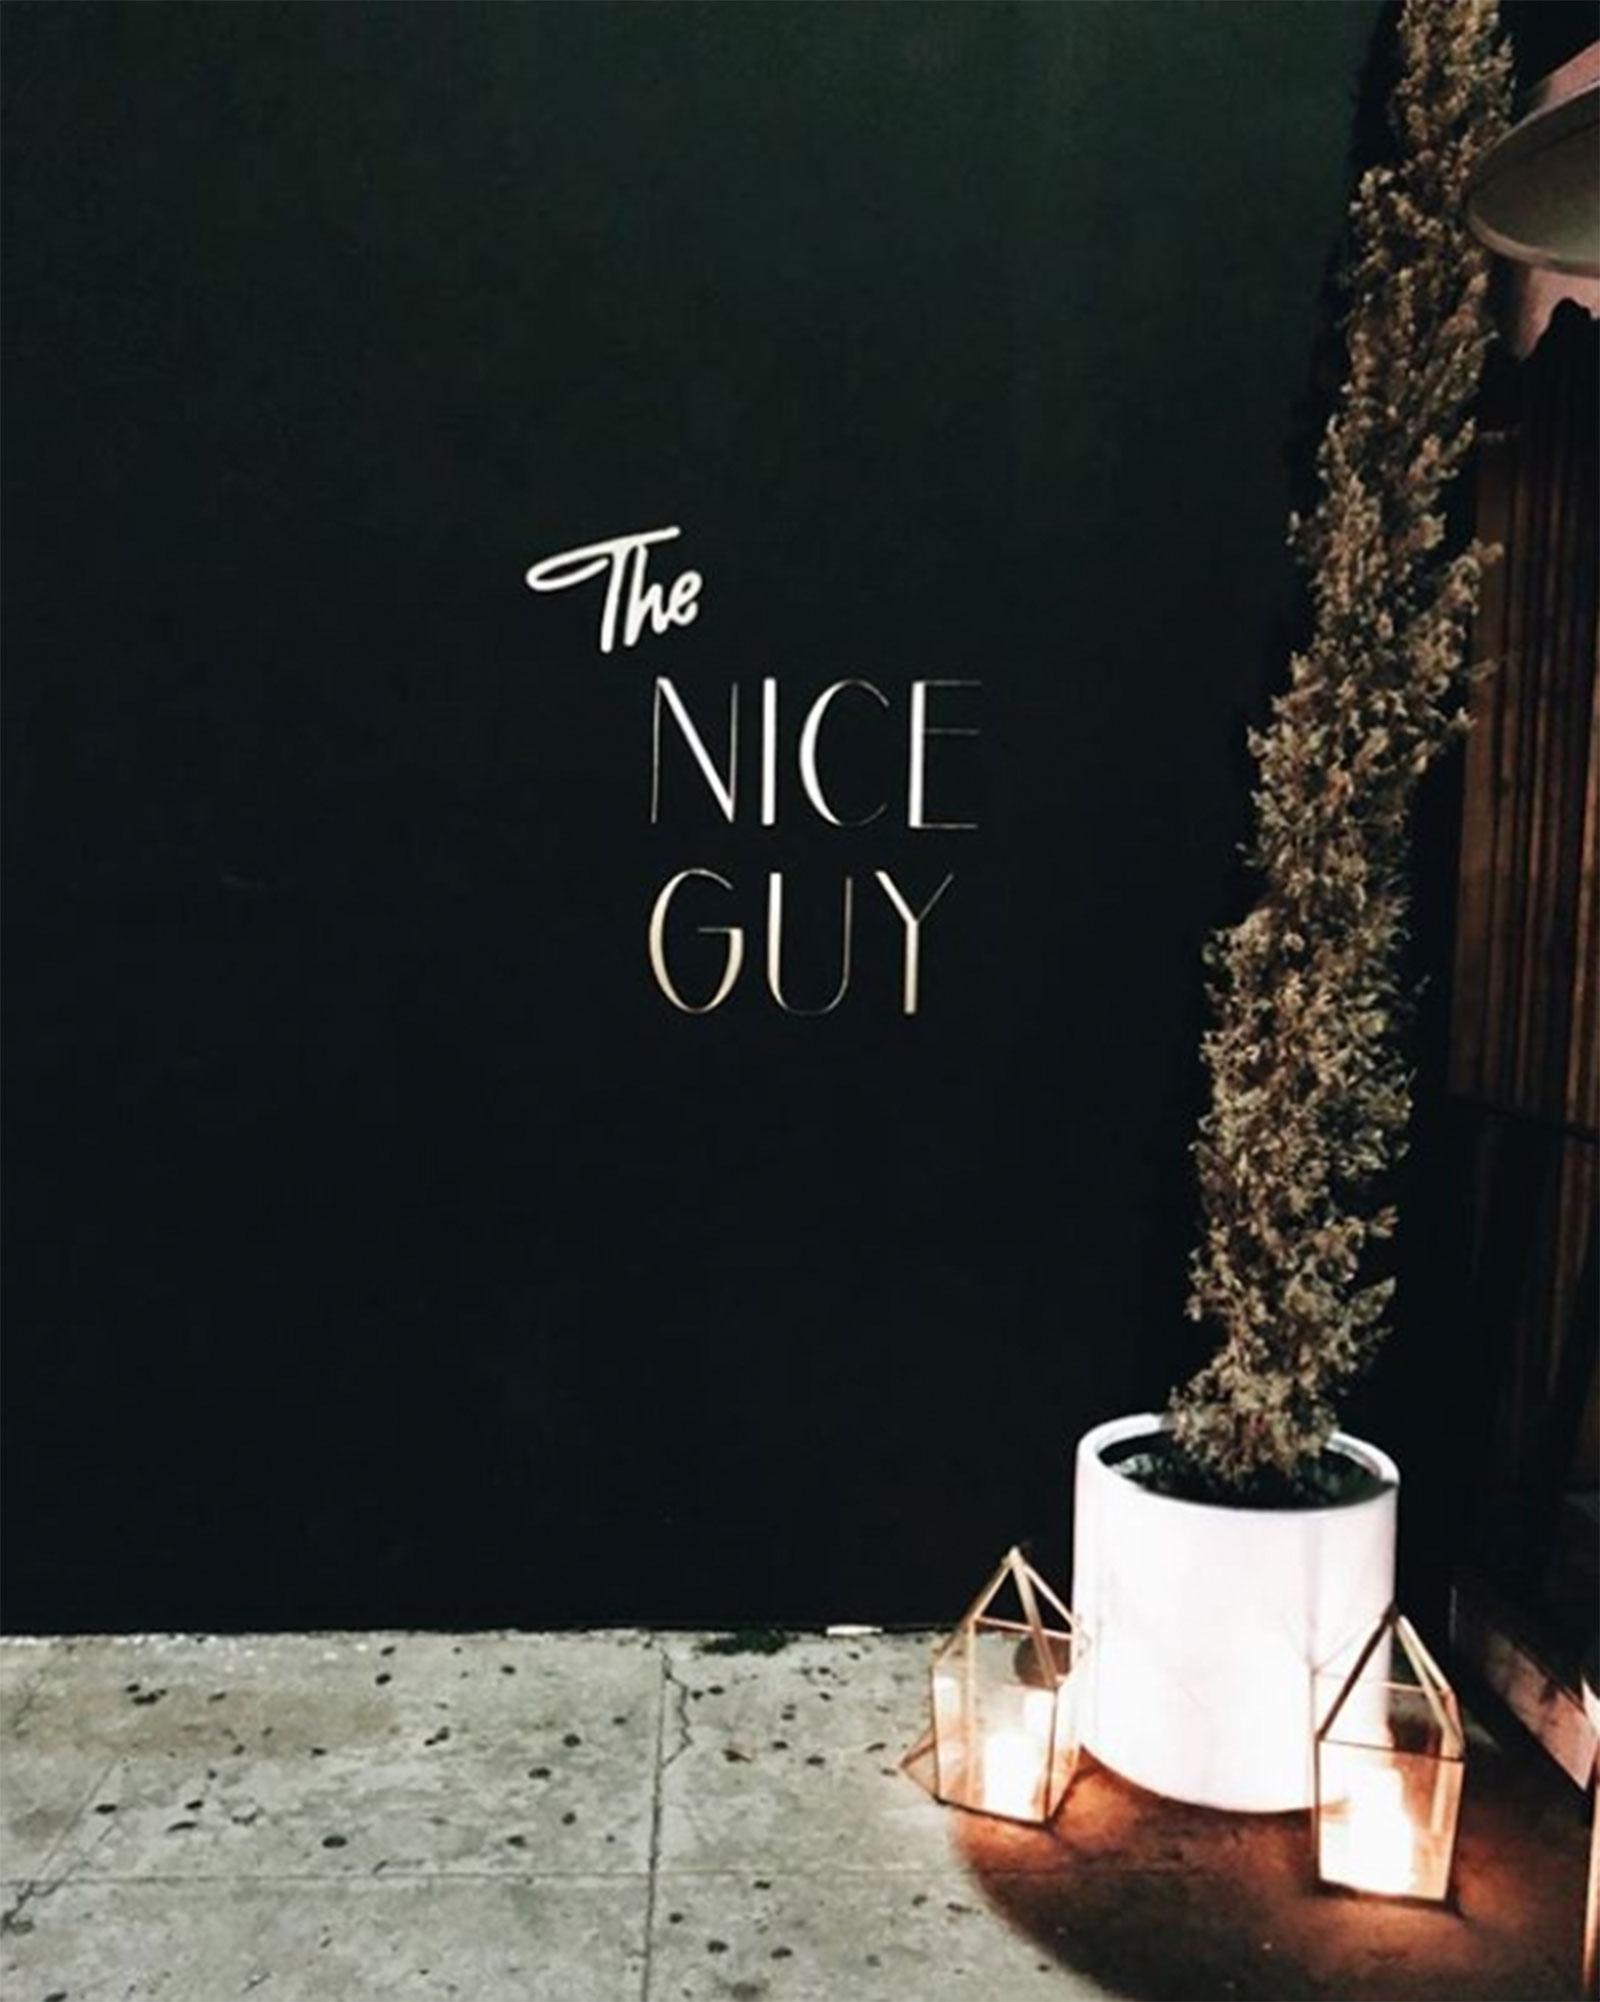 Tne_Nice_Guy_The_Ink_Collective_Pret-a-Partir_Los_Angeles_7.jpg